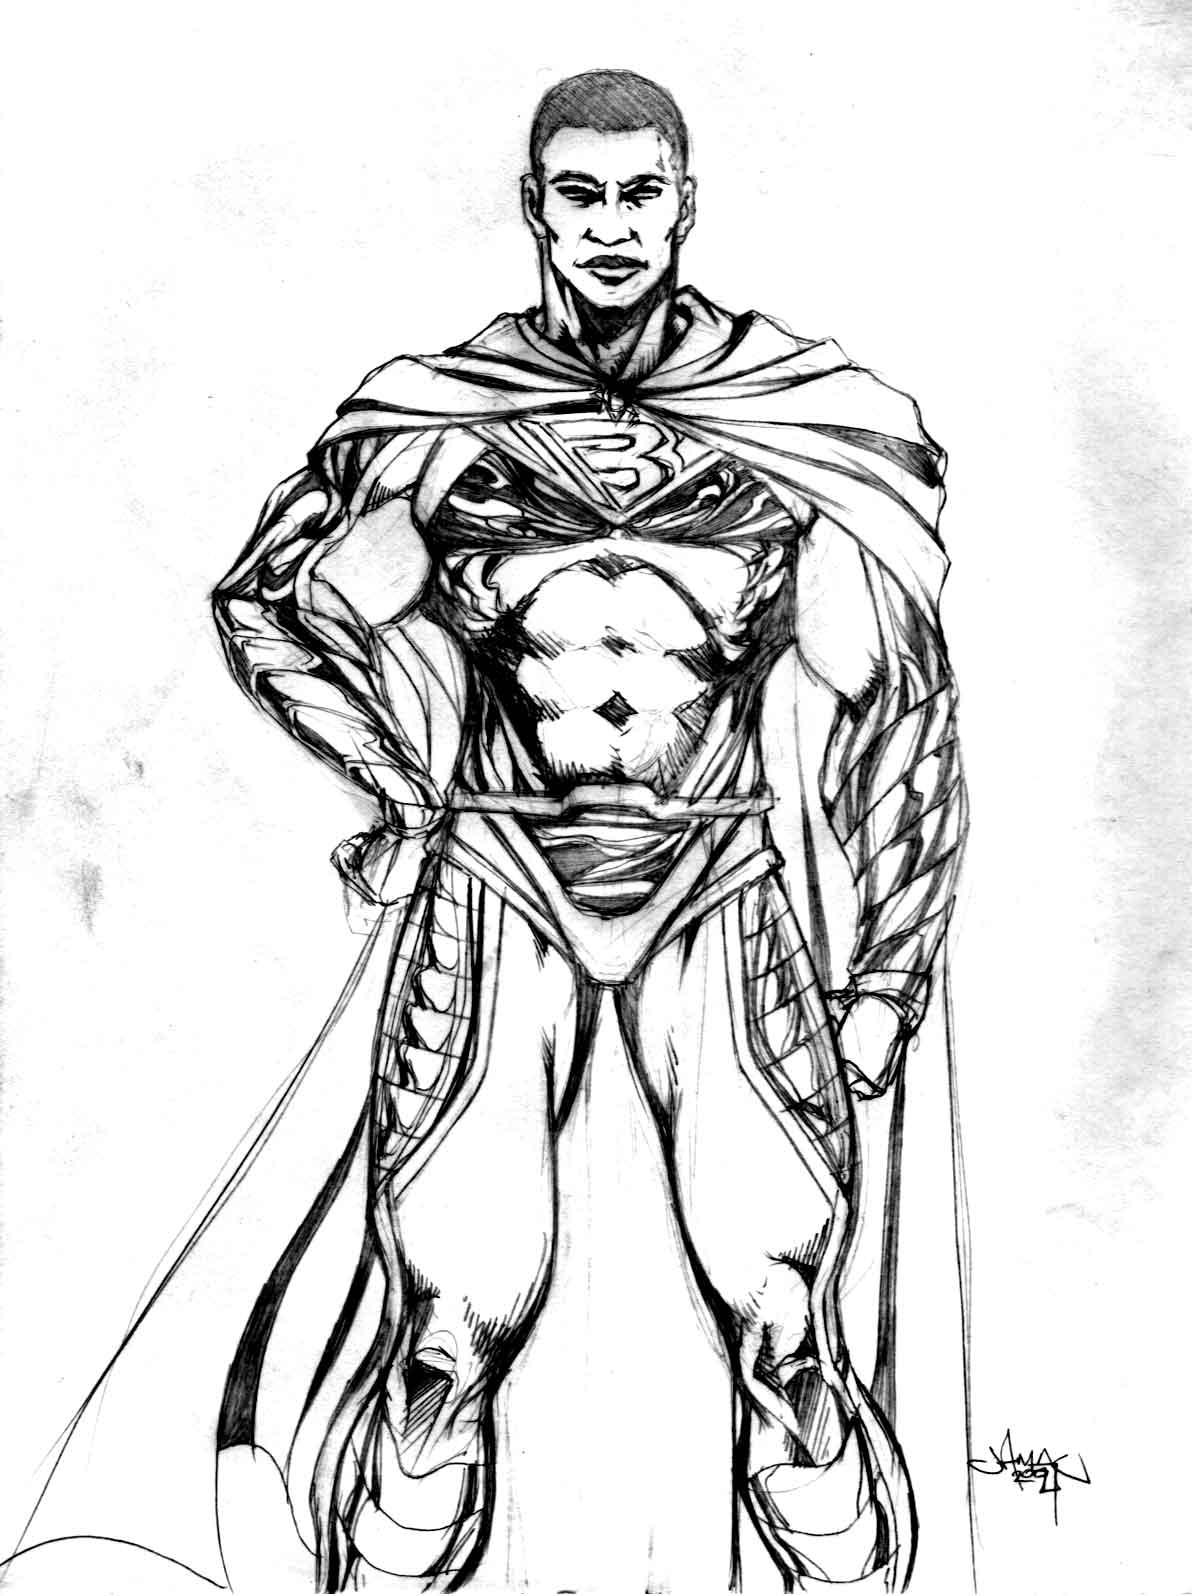 BLK-SUPERMAN-REVISED.jpg